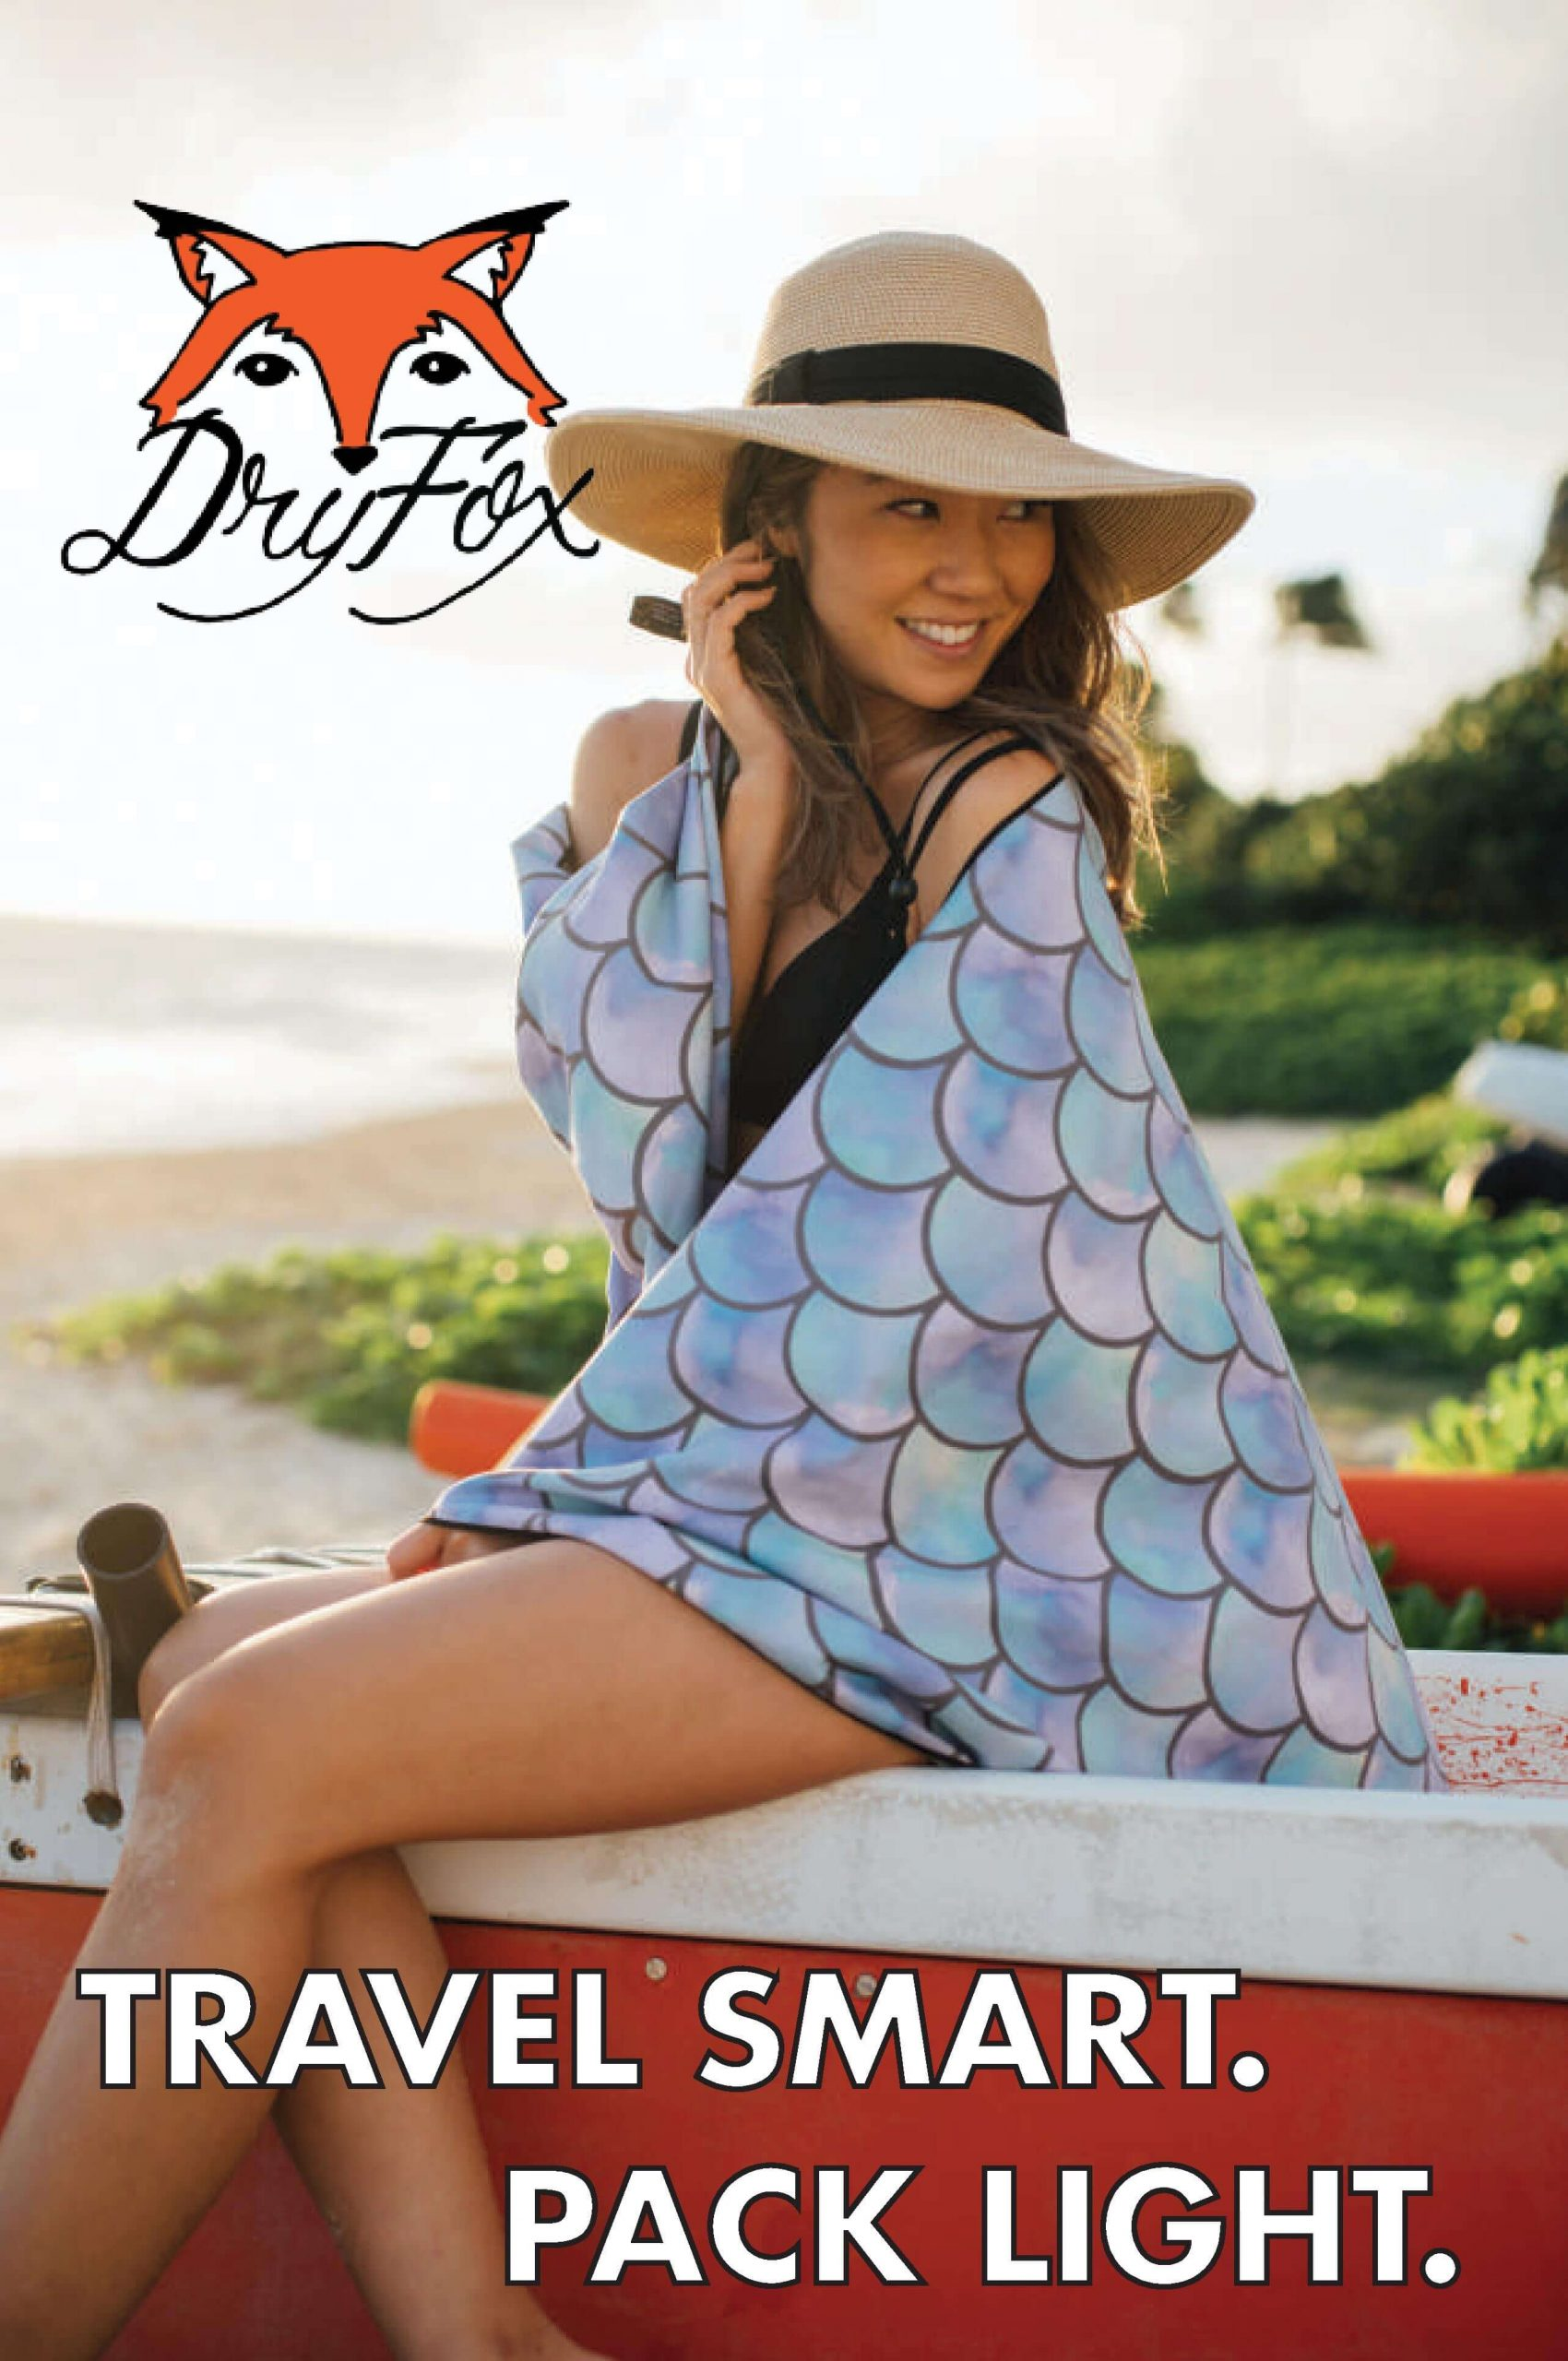 DryFoxCo Quick-Drying Towel Set